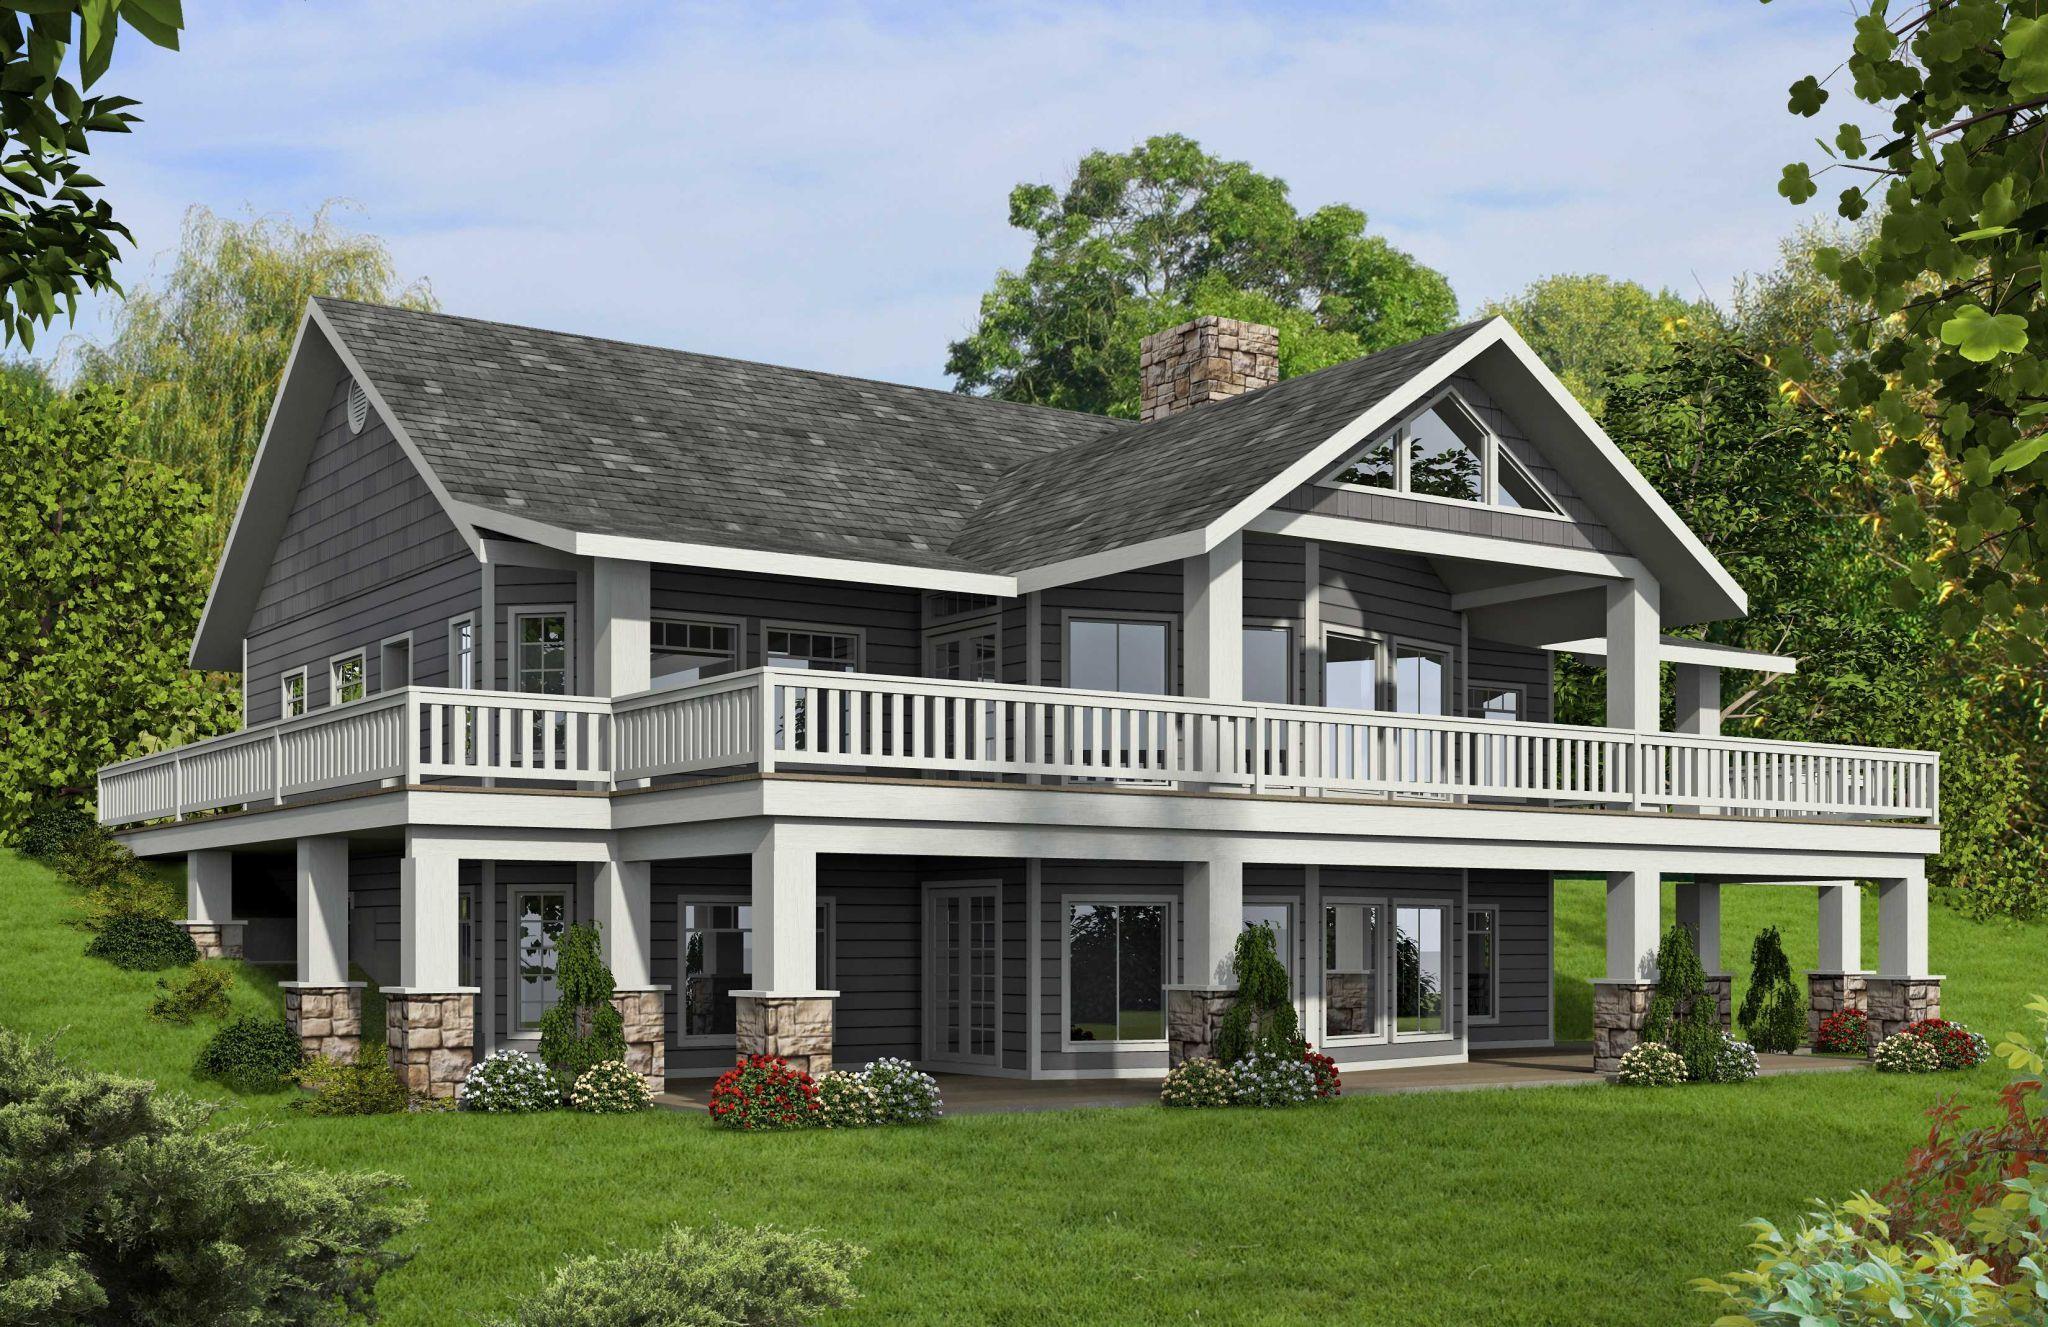 Open Floor House Plans With Walkout Basement Basement House Plans Mountain House Plans Ranch Style House Plans